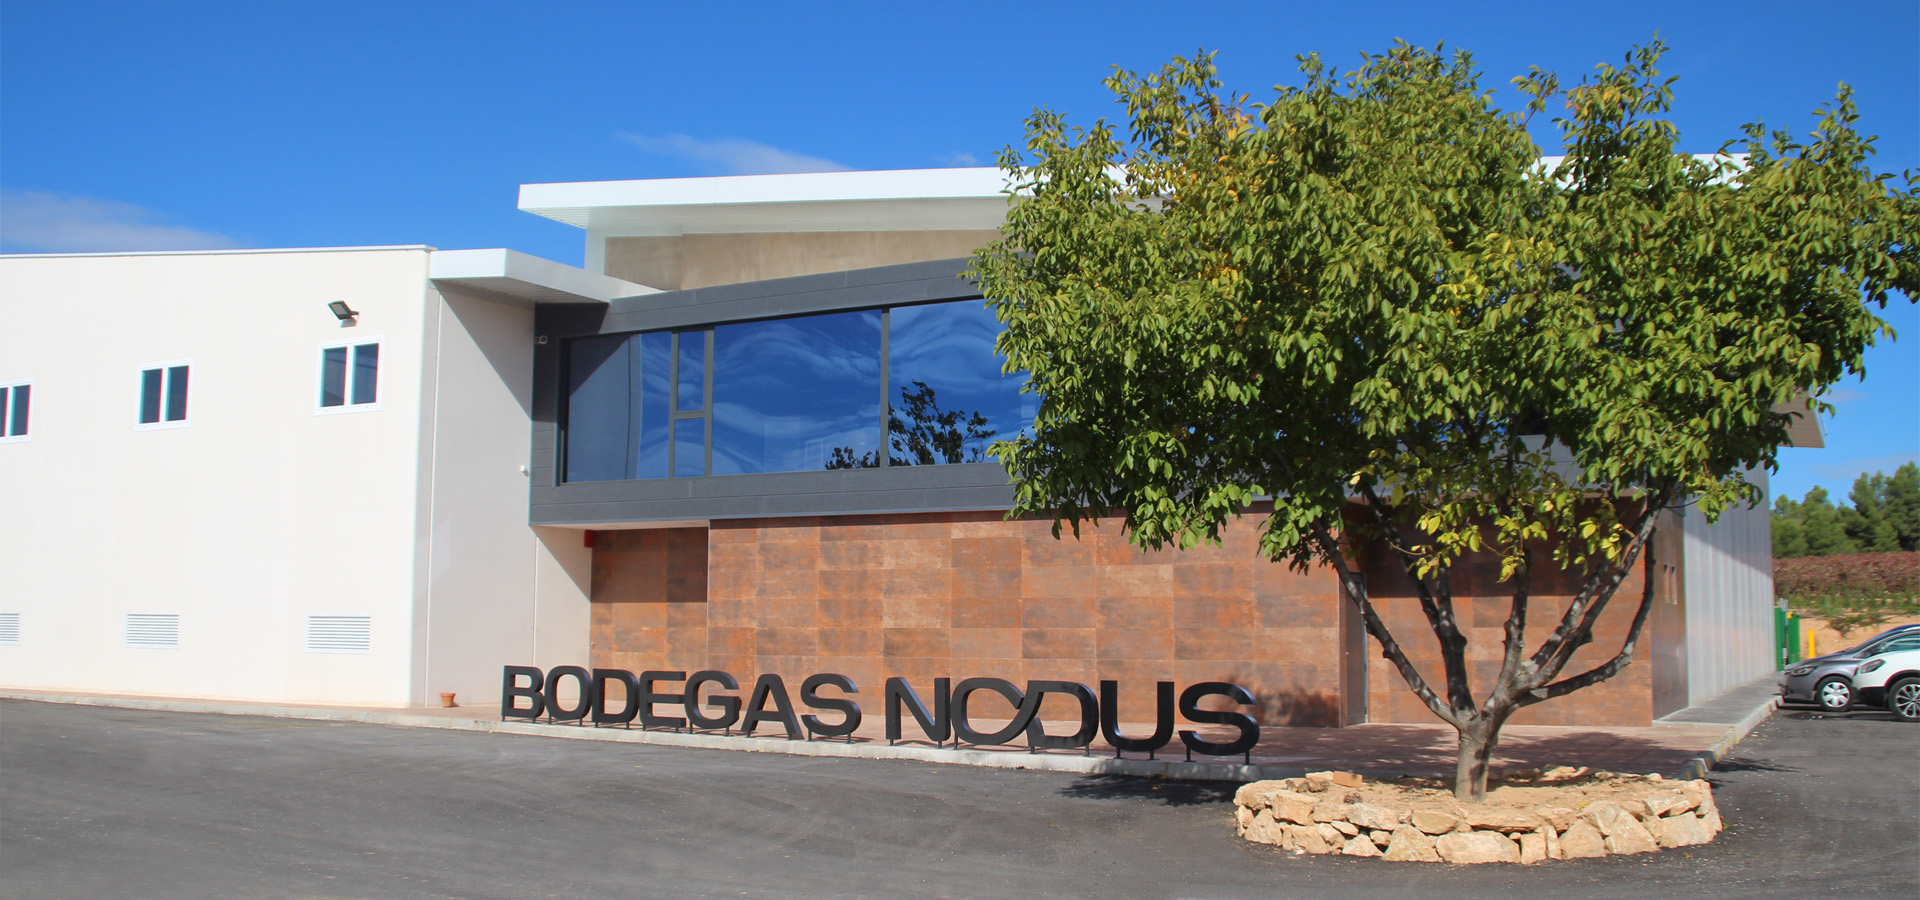 Enoturismo en Bodegas Nodus